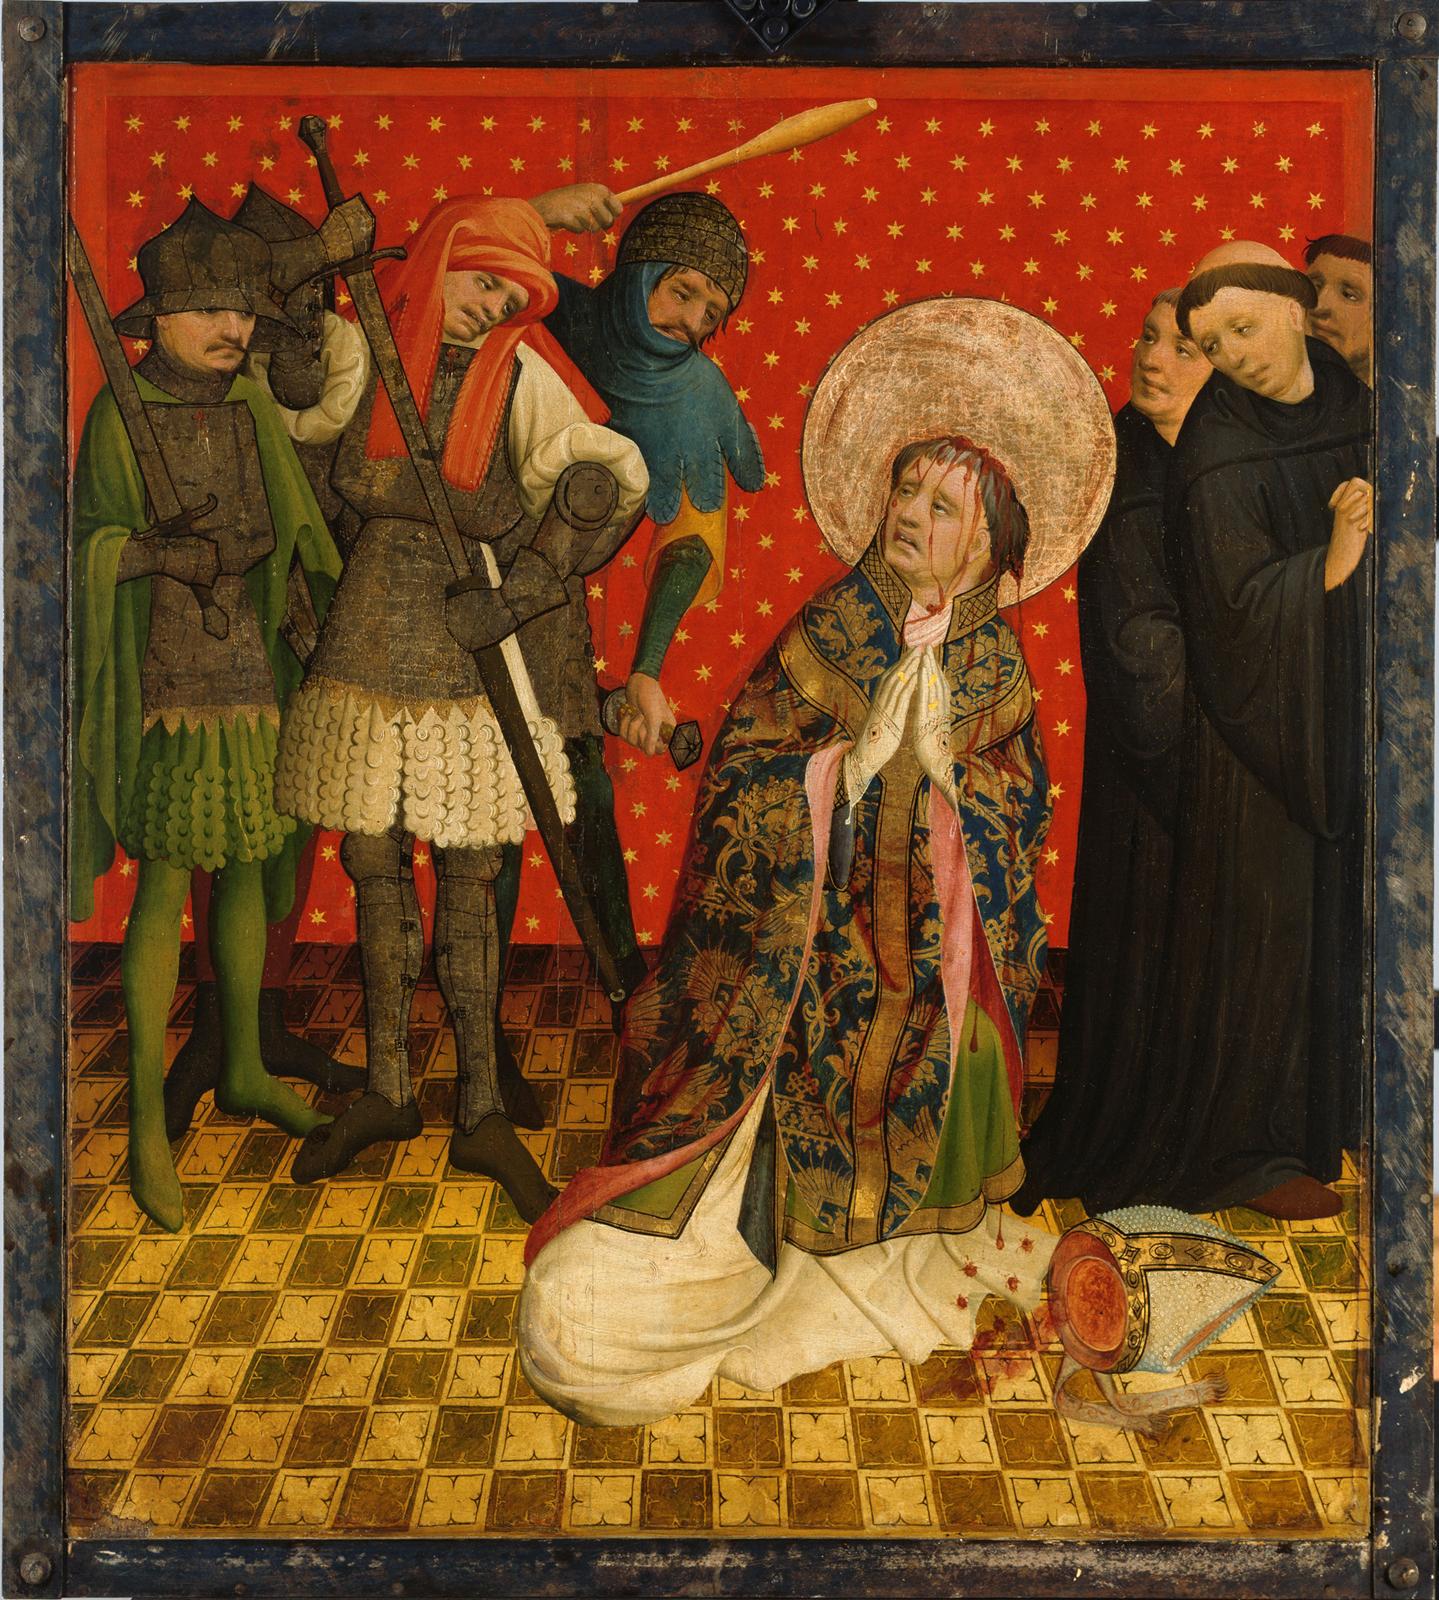 Hamburger Meister, gen. Meister Francke, Thomas Altar, 1424 (?),